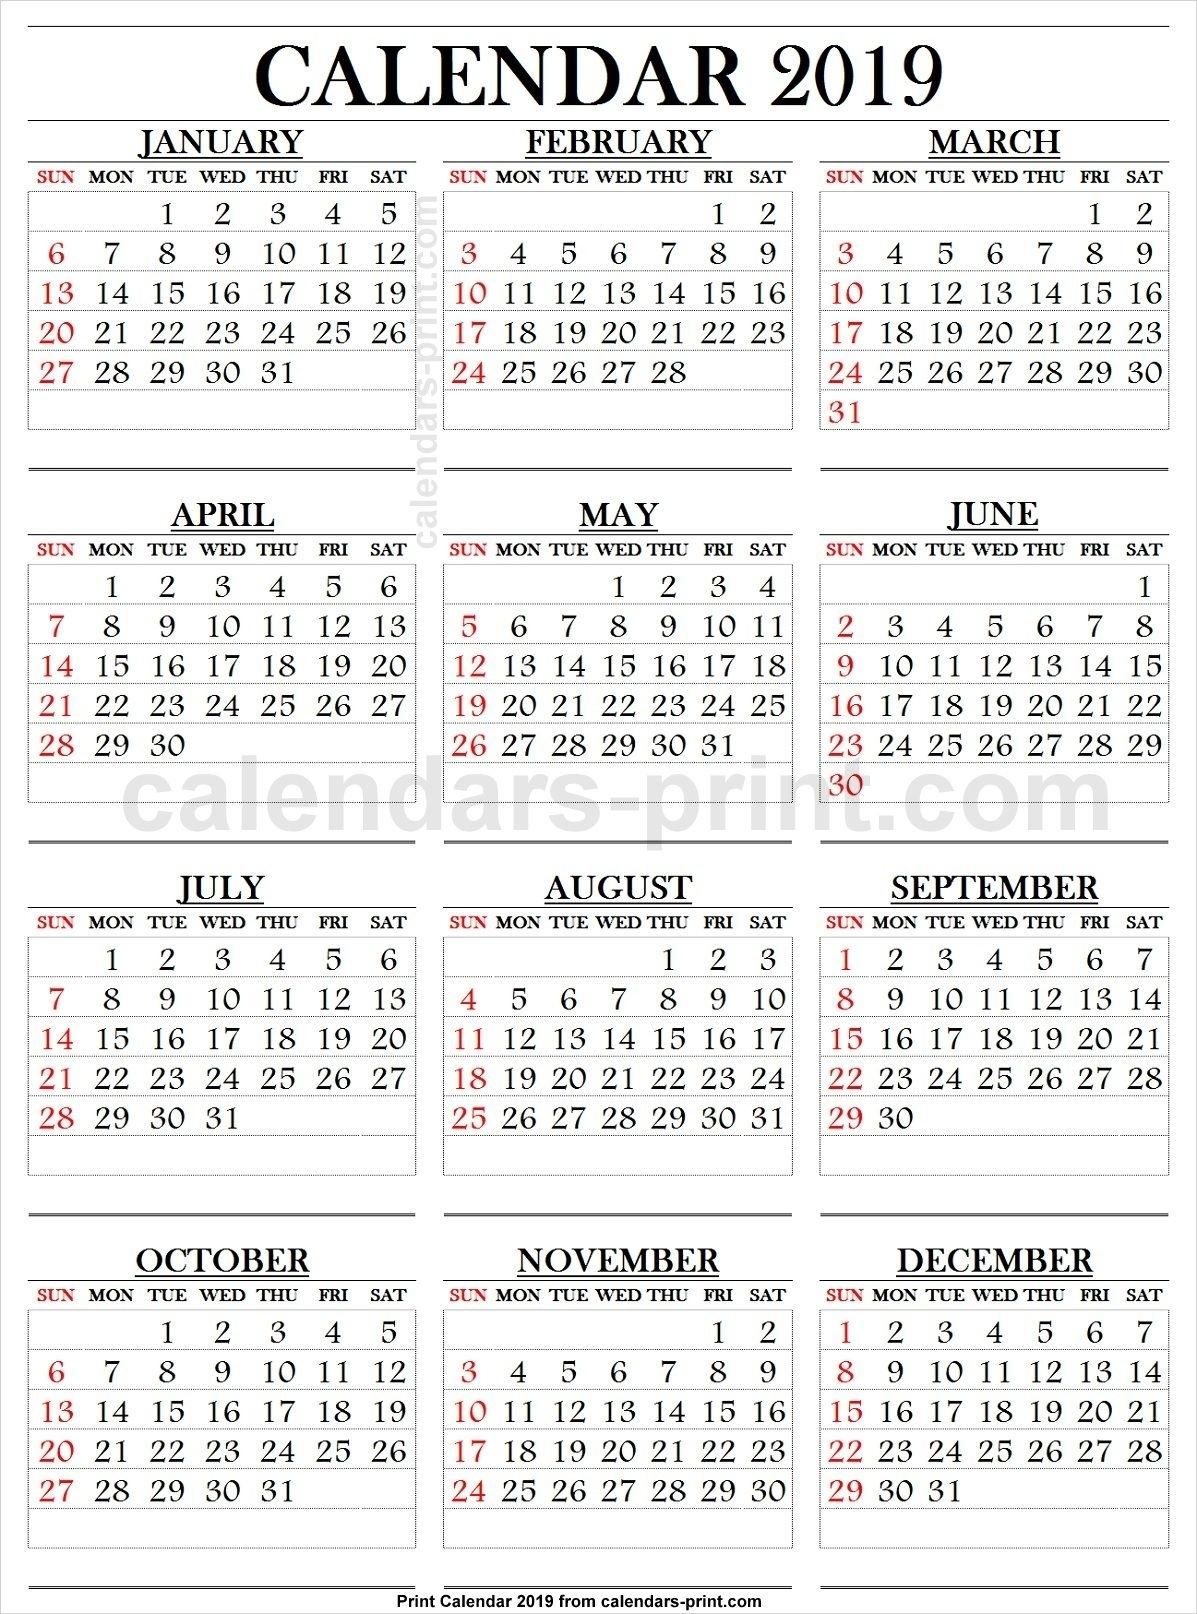 2019 Calendar Large Numbers | Printable Calendar Large